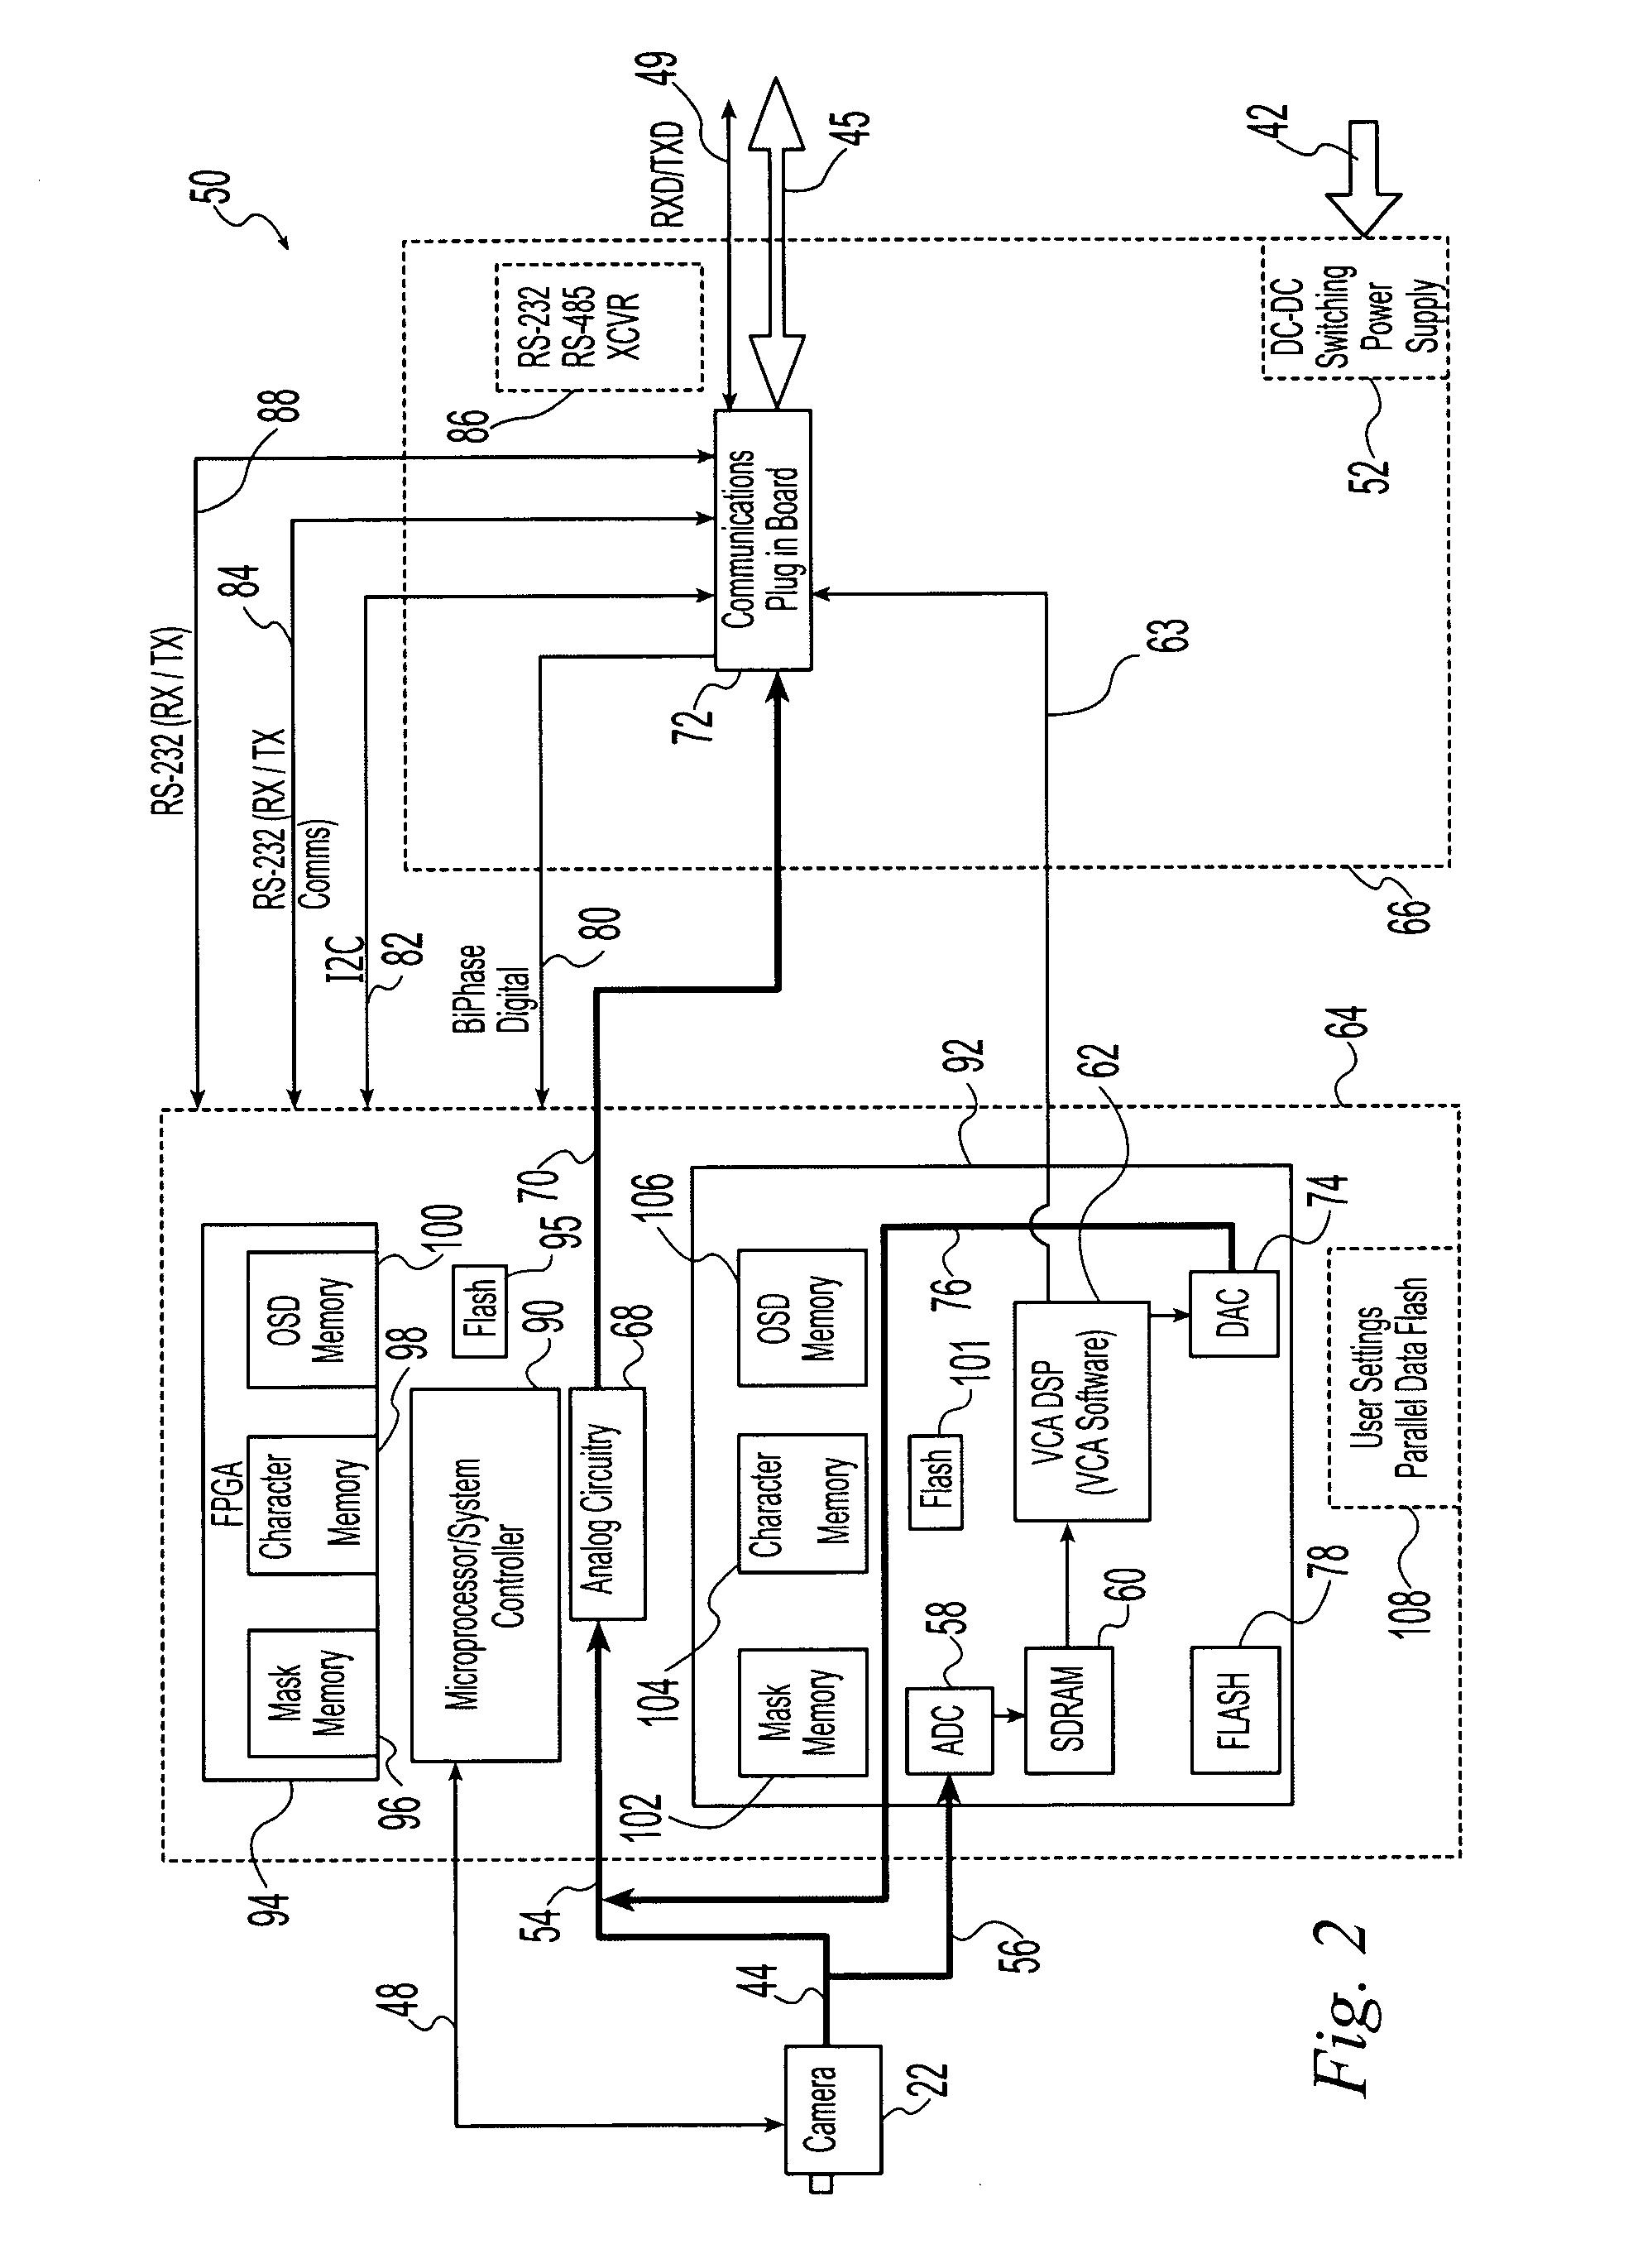 Bosch ptz camera wiring diagram manual wiki share autodome ptz camera wiring diagram cheapraybanclubmaster Choice Image